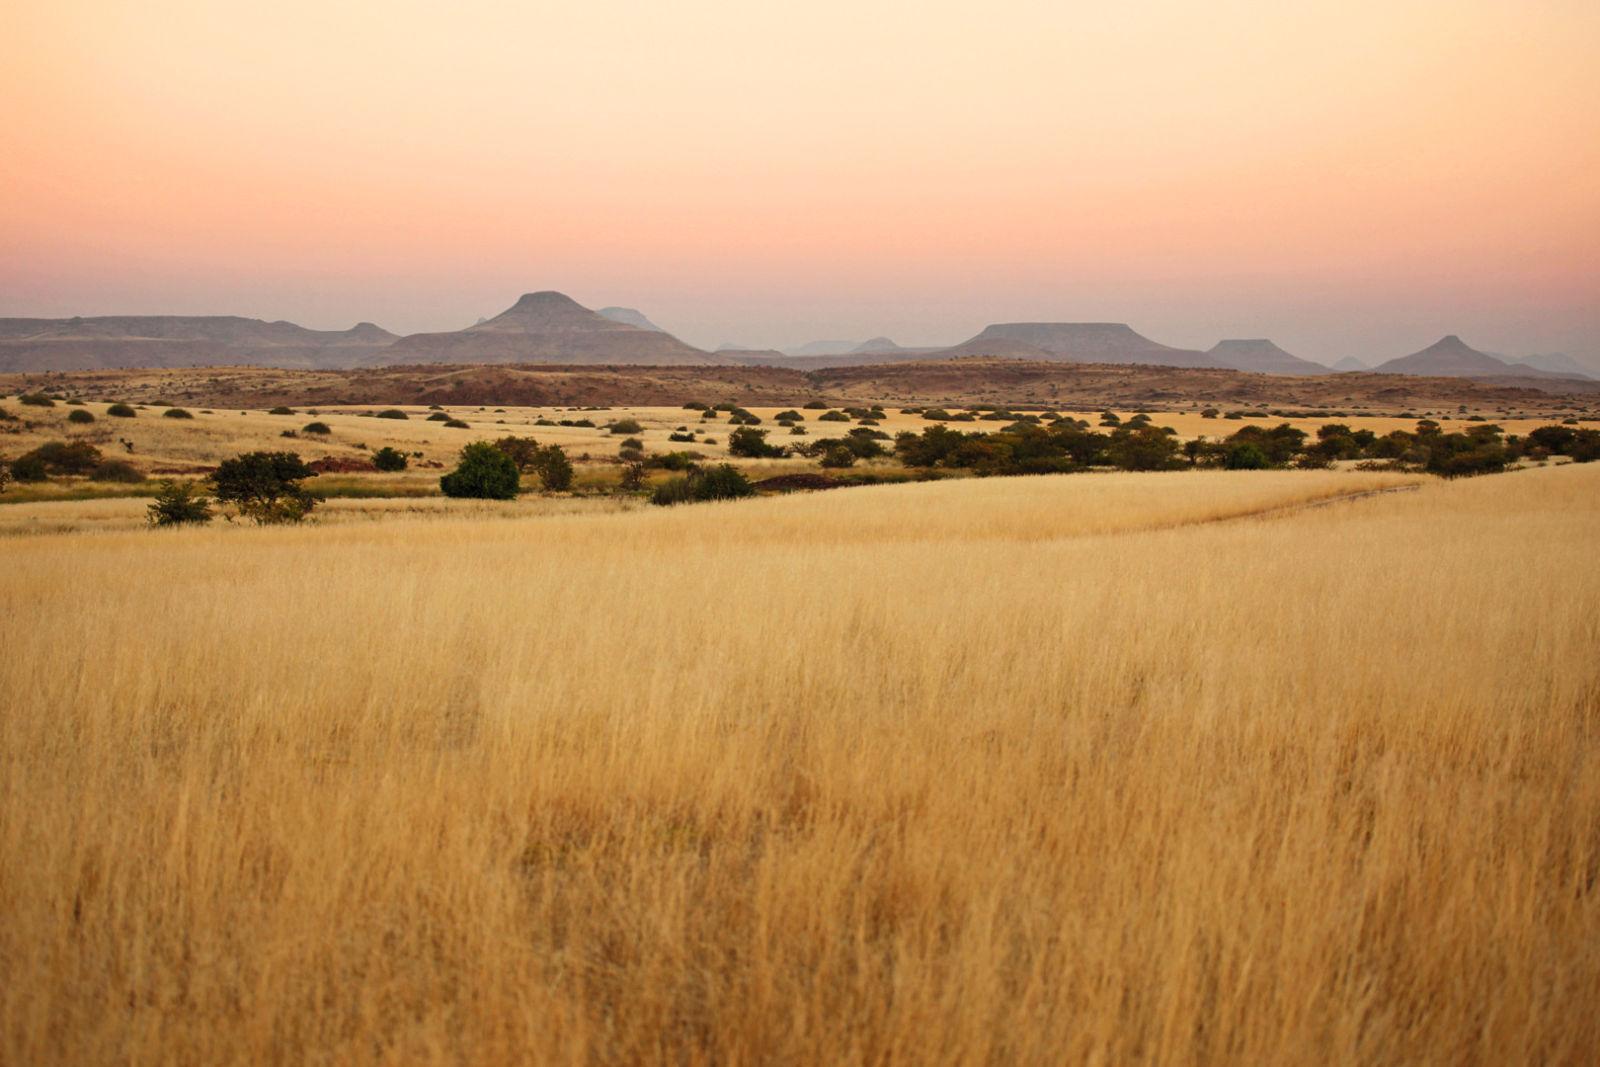 Namibia - Sustainable hunting in the Nyae Nyae Conservancy - SWAROVSKI OPTIK CLOSER Magazin, Hunting, Namibian Savannah